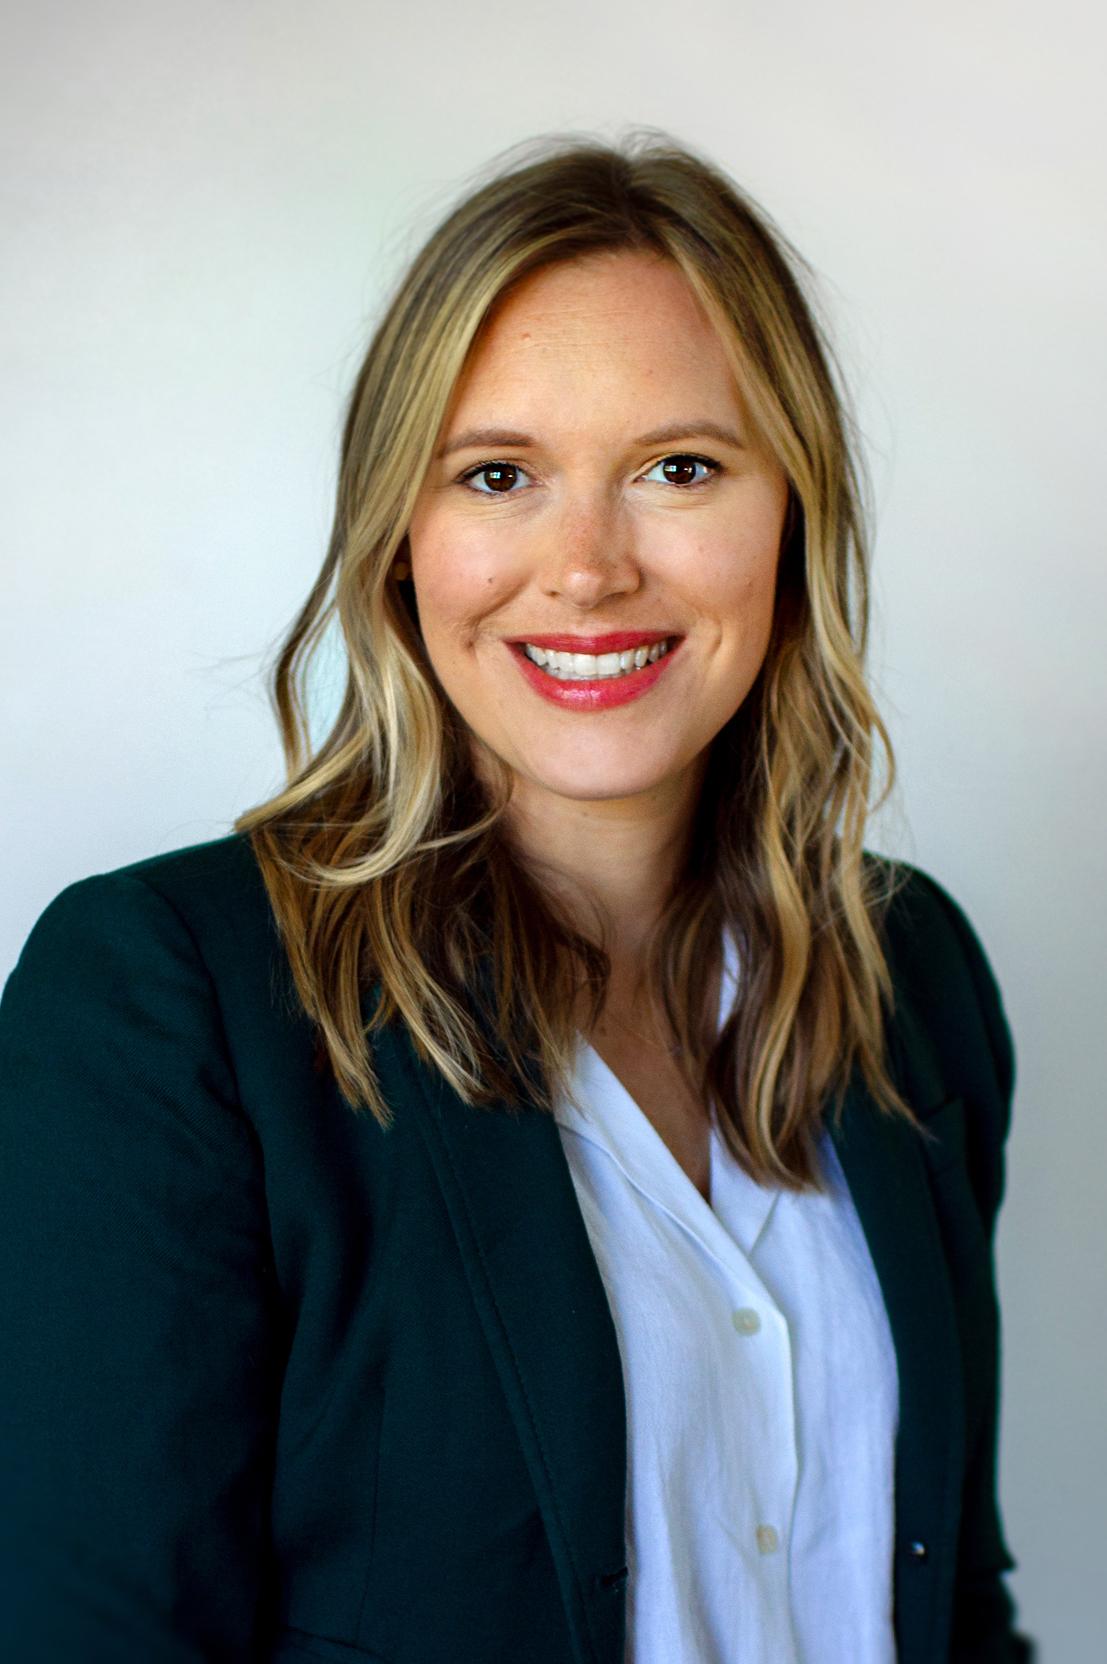 Catherine Orsborn, PhD, Director of Program Operations